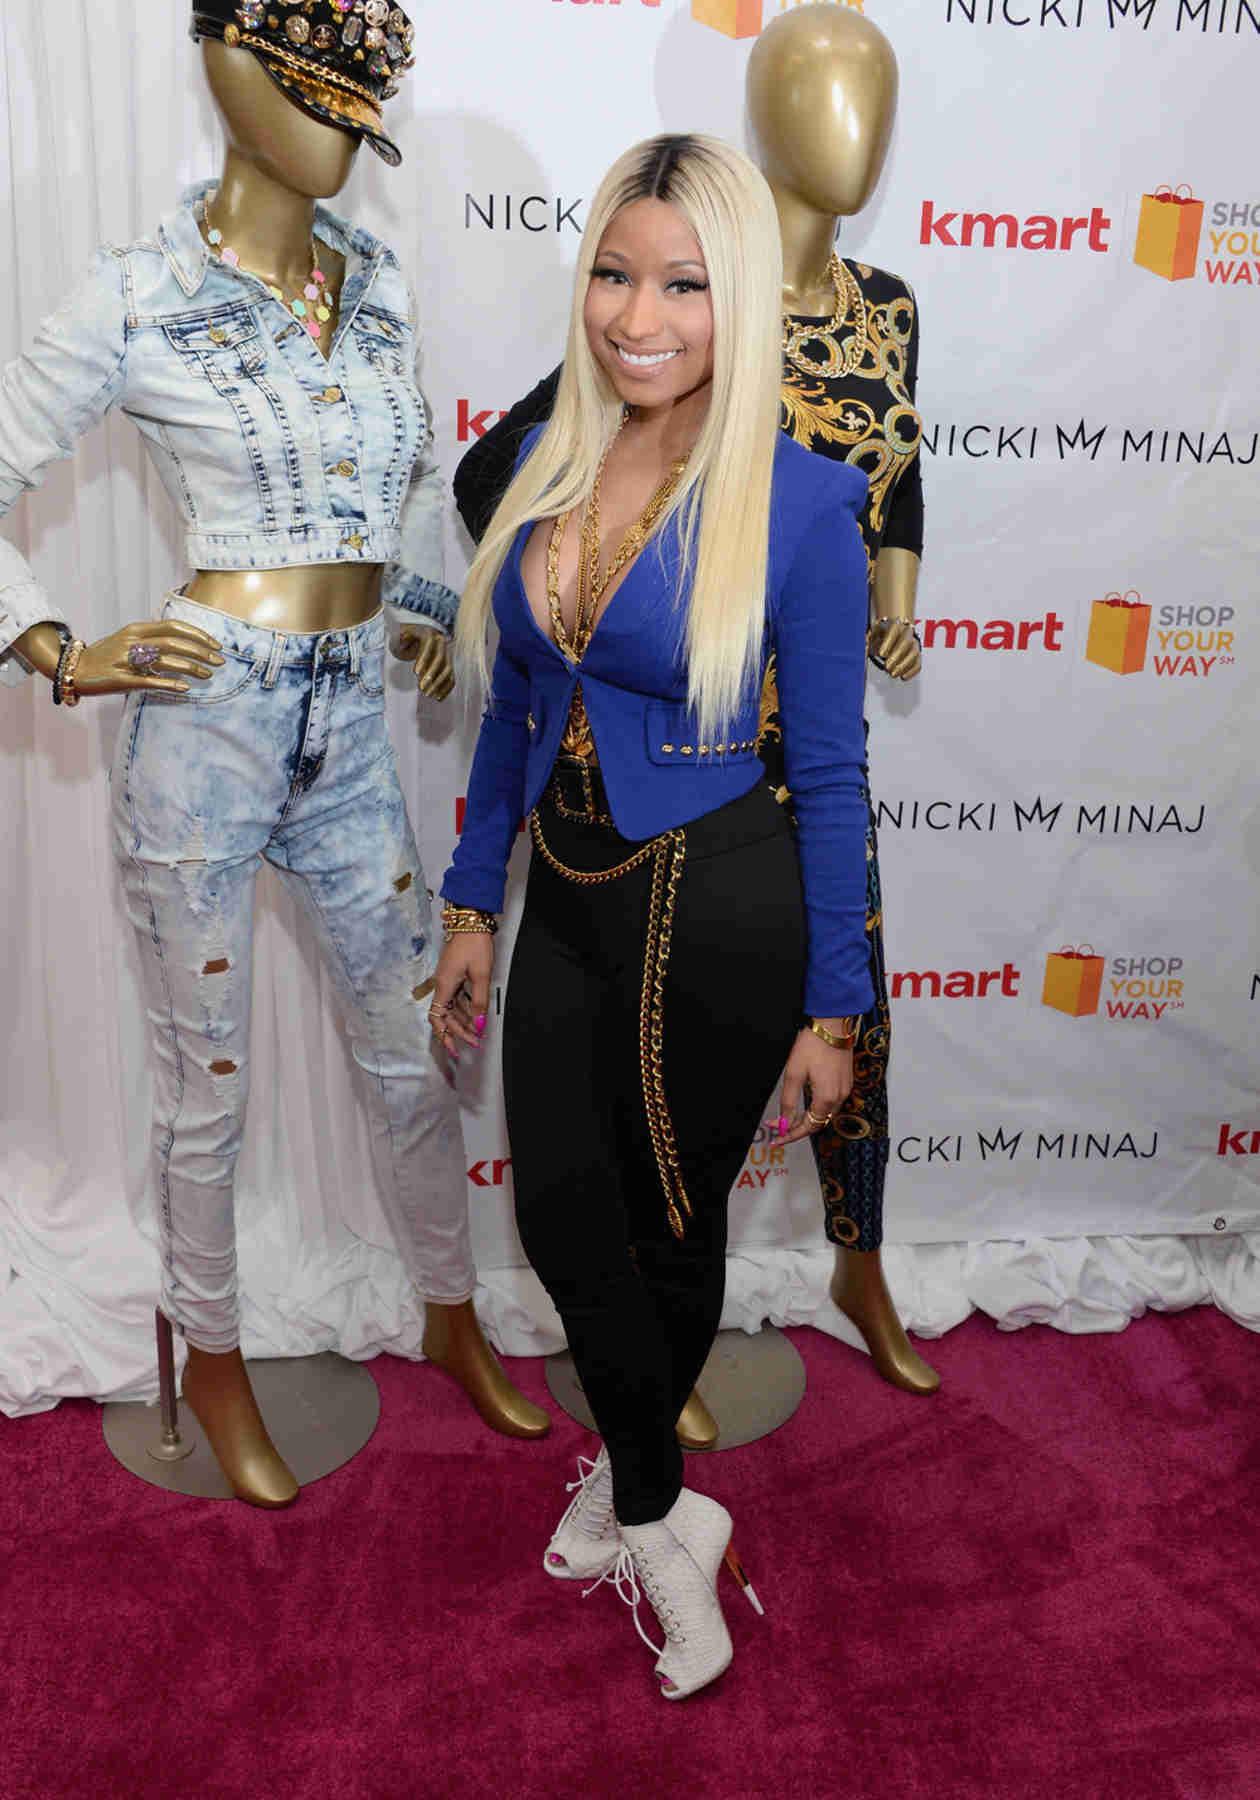 "Nicki Minaj: ""I'd Rather Die Than Call an Ambulance And Be on TMZ"""